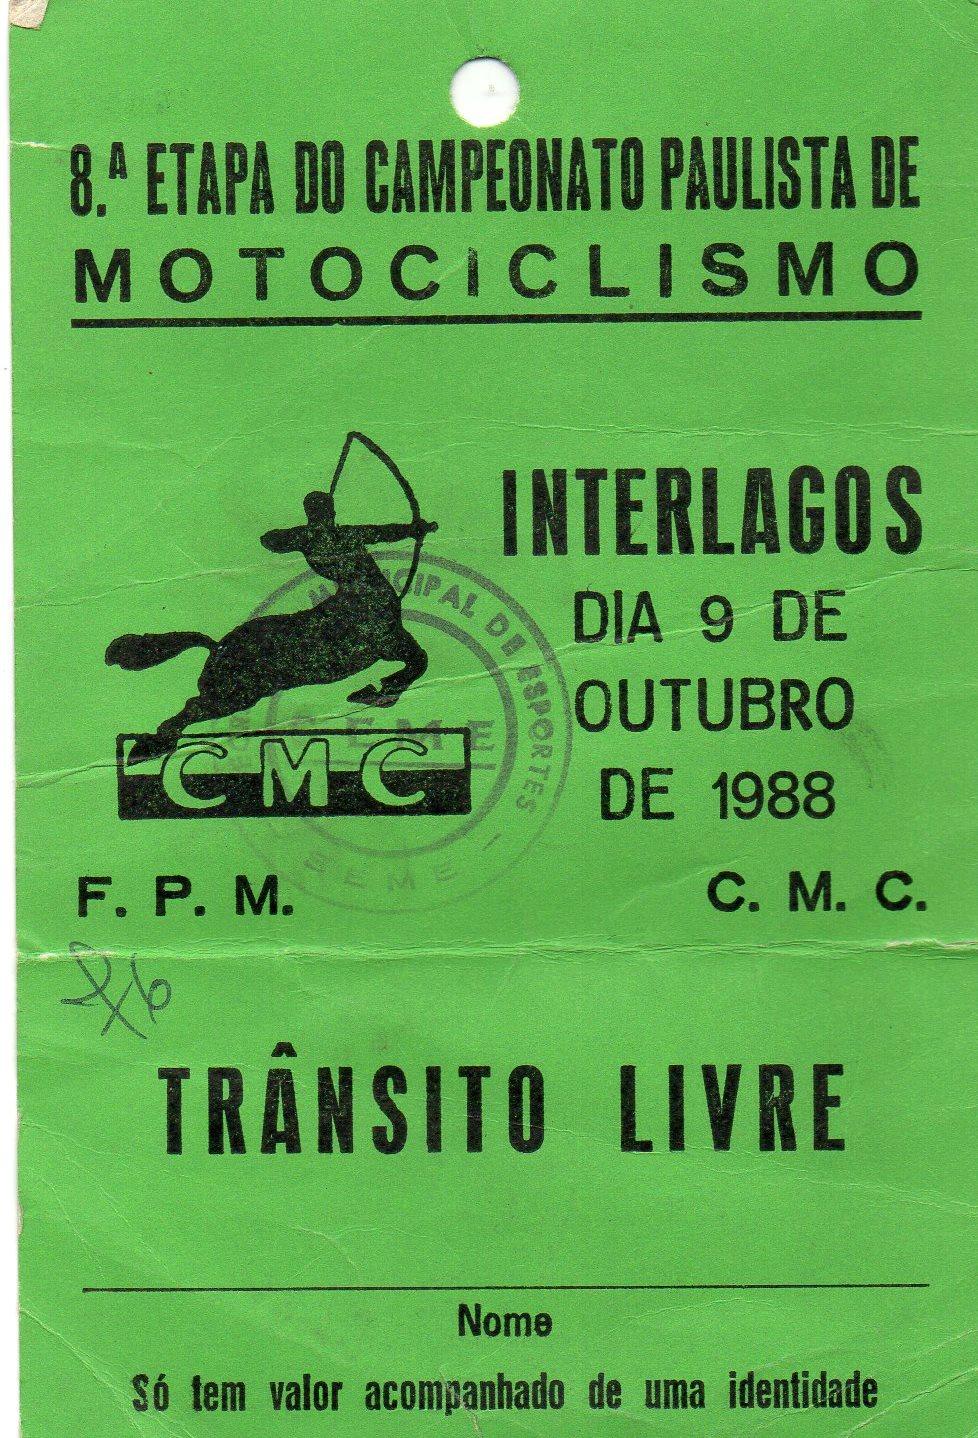 Credencial de José Luiz Gonsalves de 1988 Foto: acervo José Luiz / Motostory